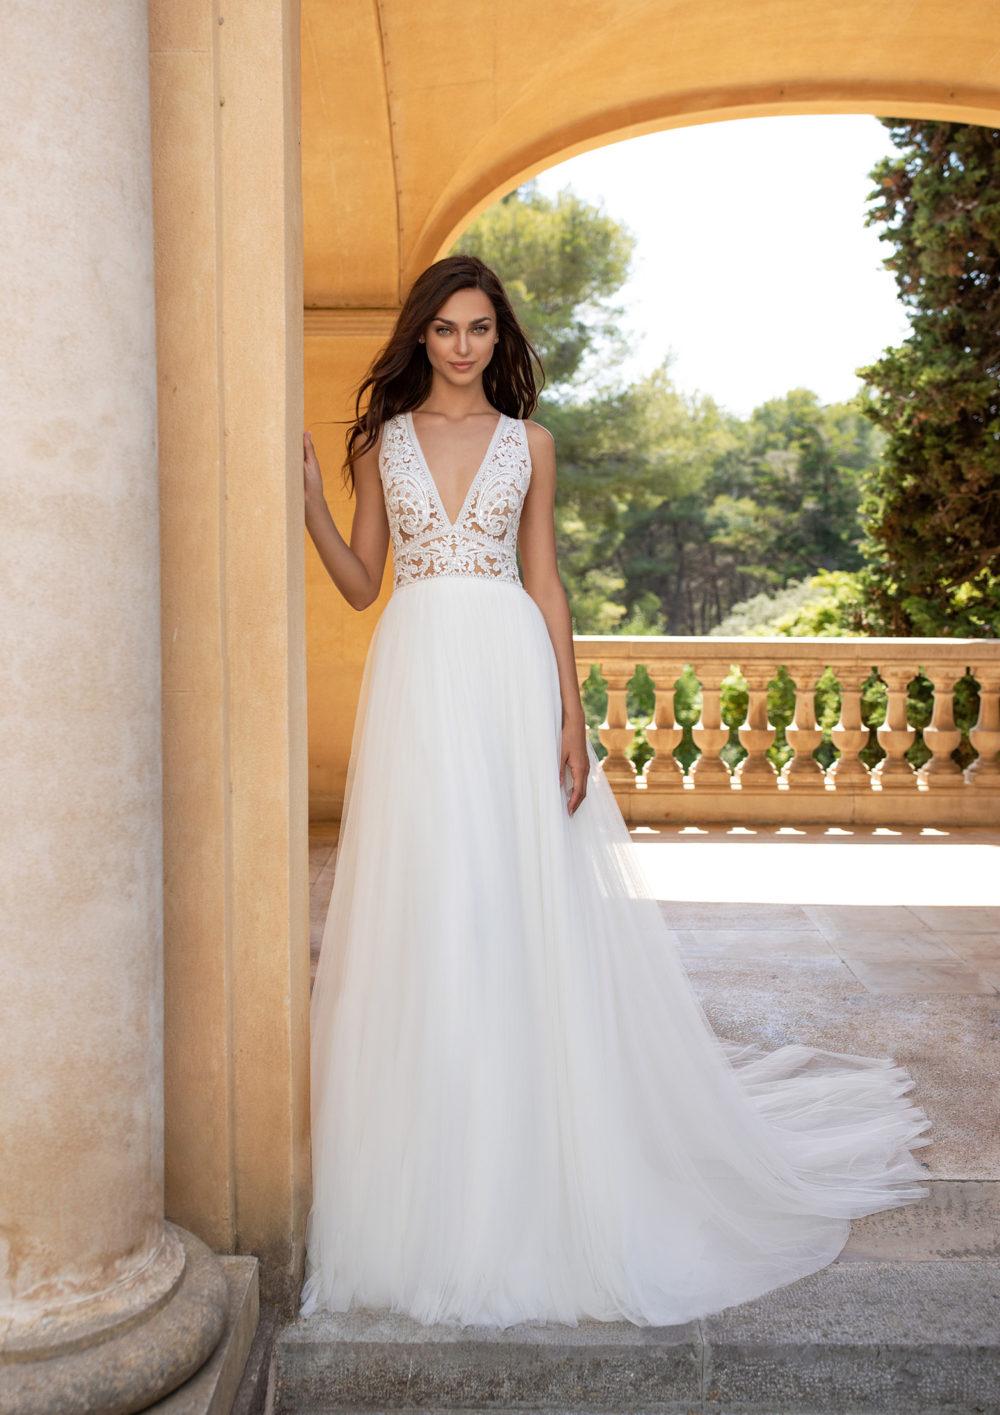 Mariages: abito da sposa Pronovias 2020 a Vicenza, Verona, Padova, Veneto ESPIGA